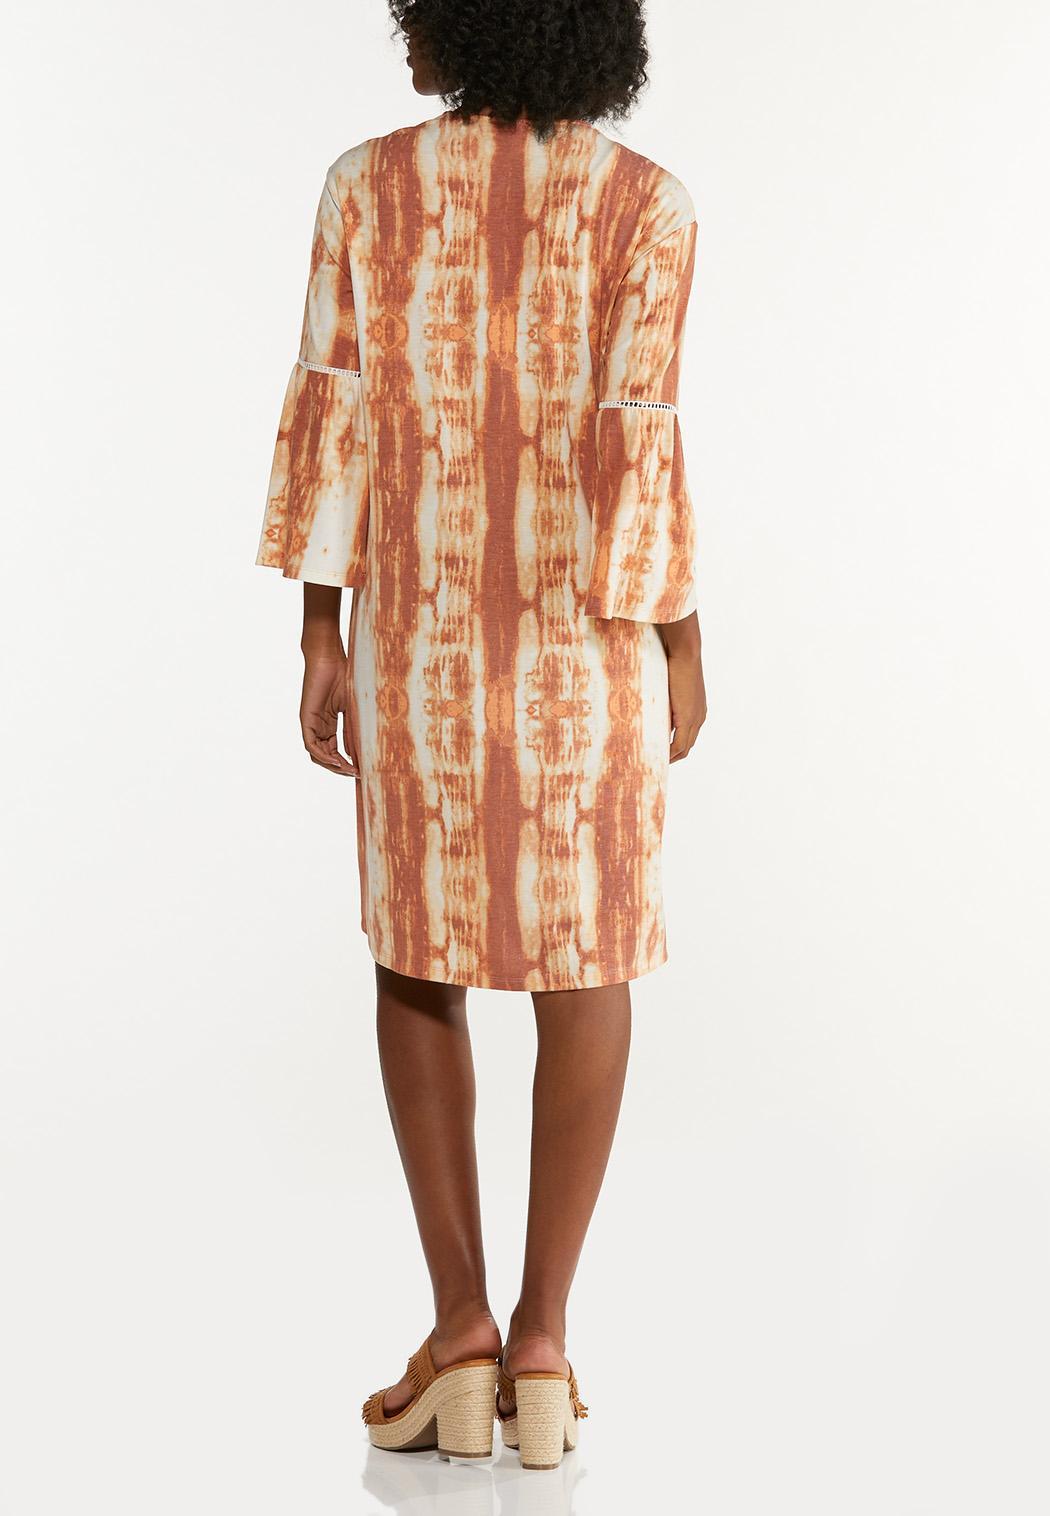 Plus Size Caramel Tie Dye Cardigan (Item #44681012)